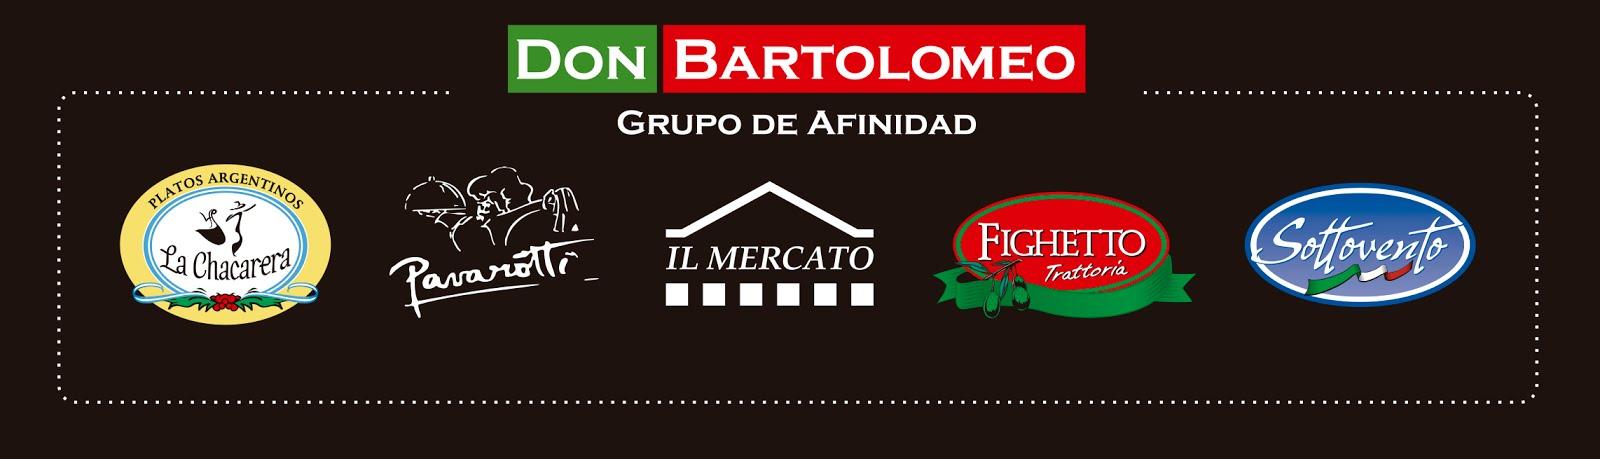 Grupo Don Bartolomeo